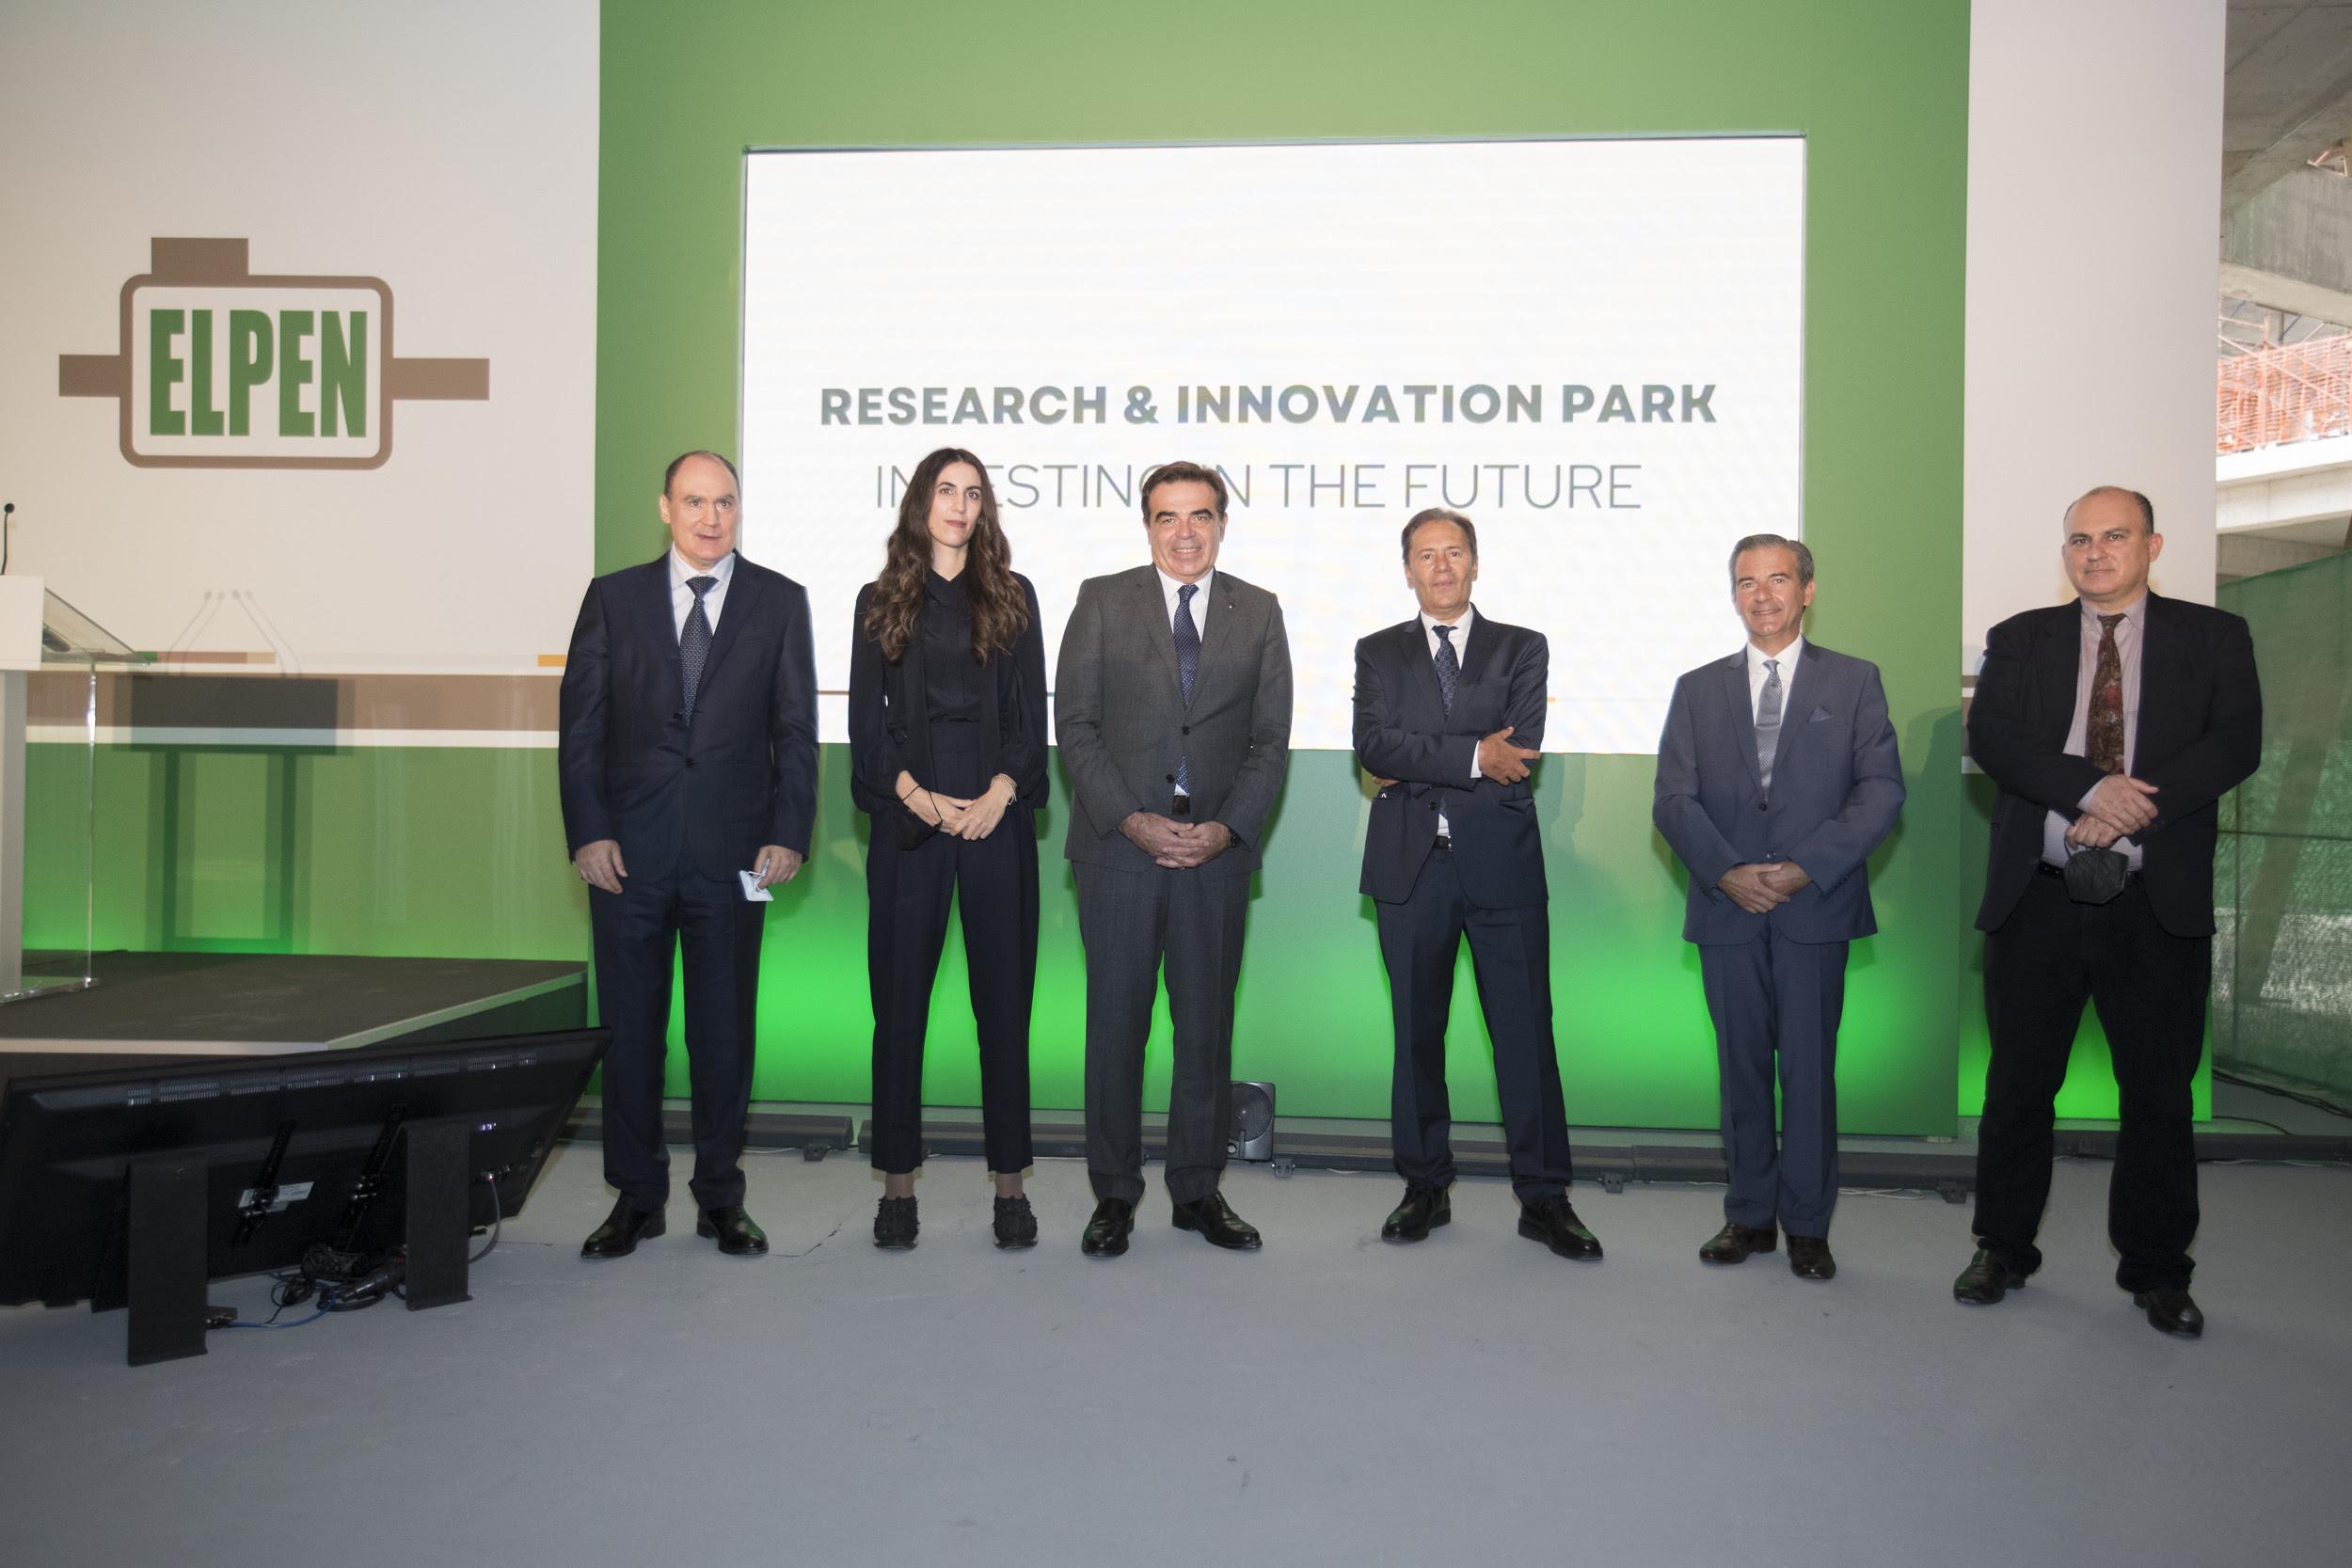 ELPEN Σχοινάς : Ο Αντιπρόεδρος της Ευρωπαϊκής Επιτροπής επισκέφθηκε το εργοστάσιο[pic-vid]